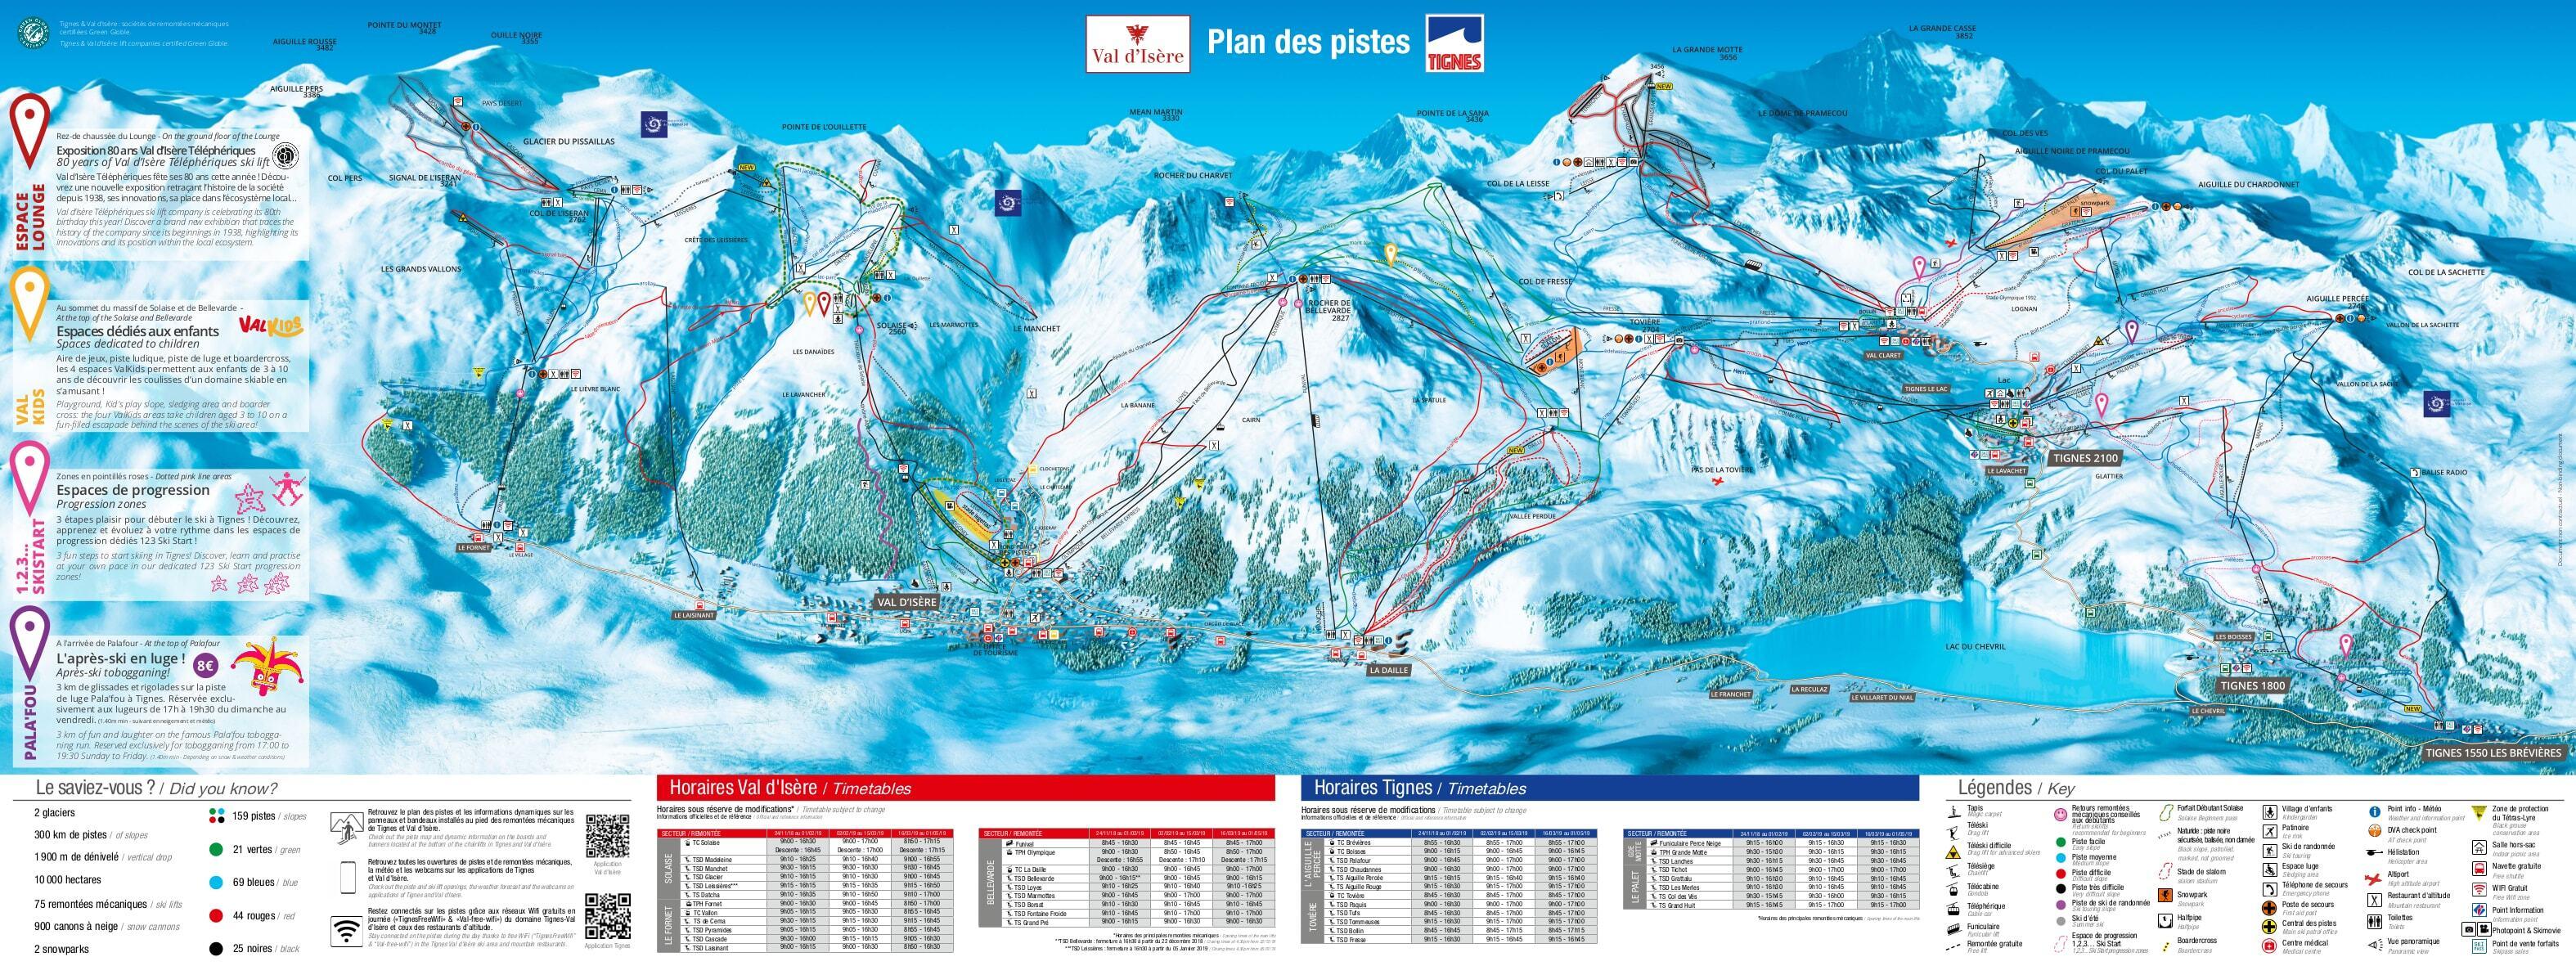 tignes ski resort guide location map tignes ski holiday accommodation. Black Bedroom Furniture Sets. Home Design Ideas